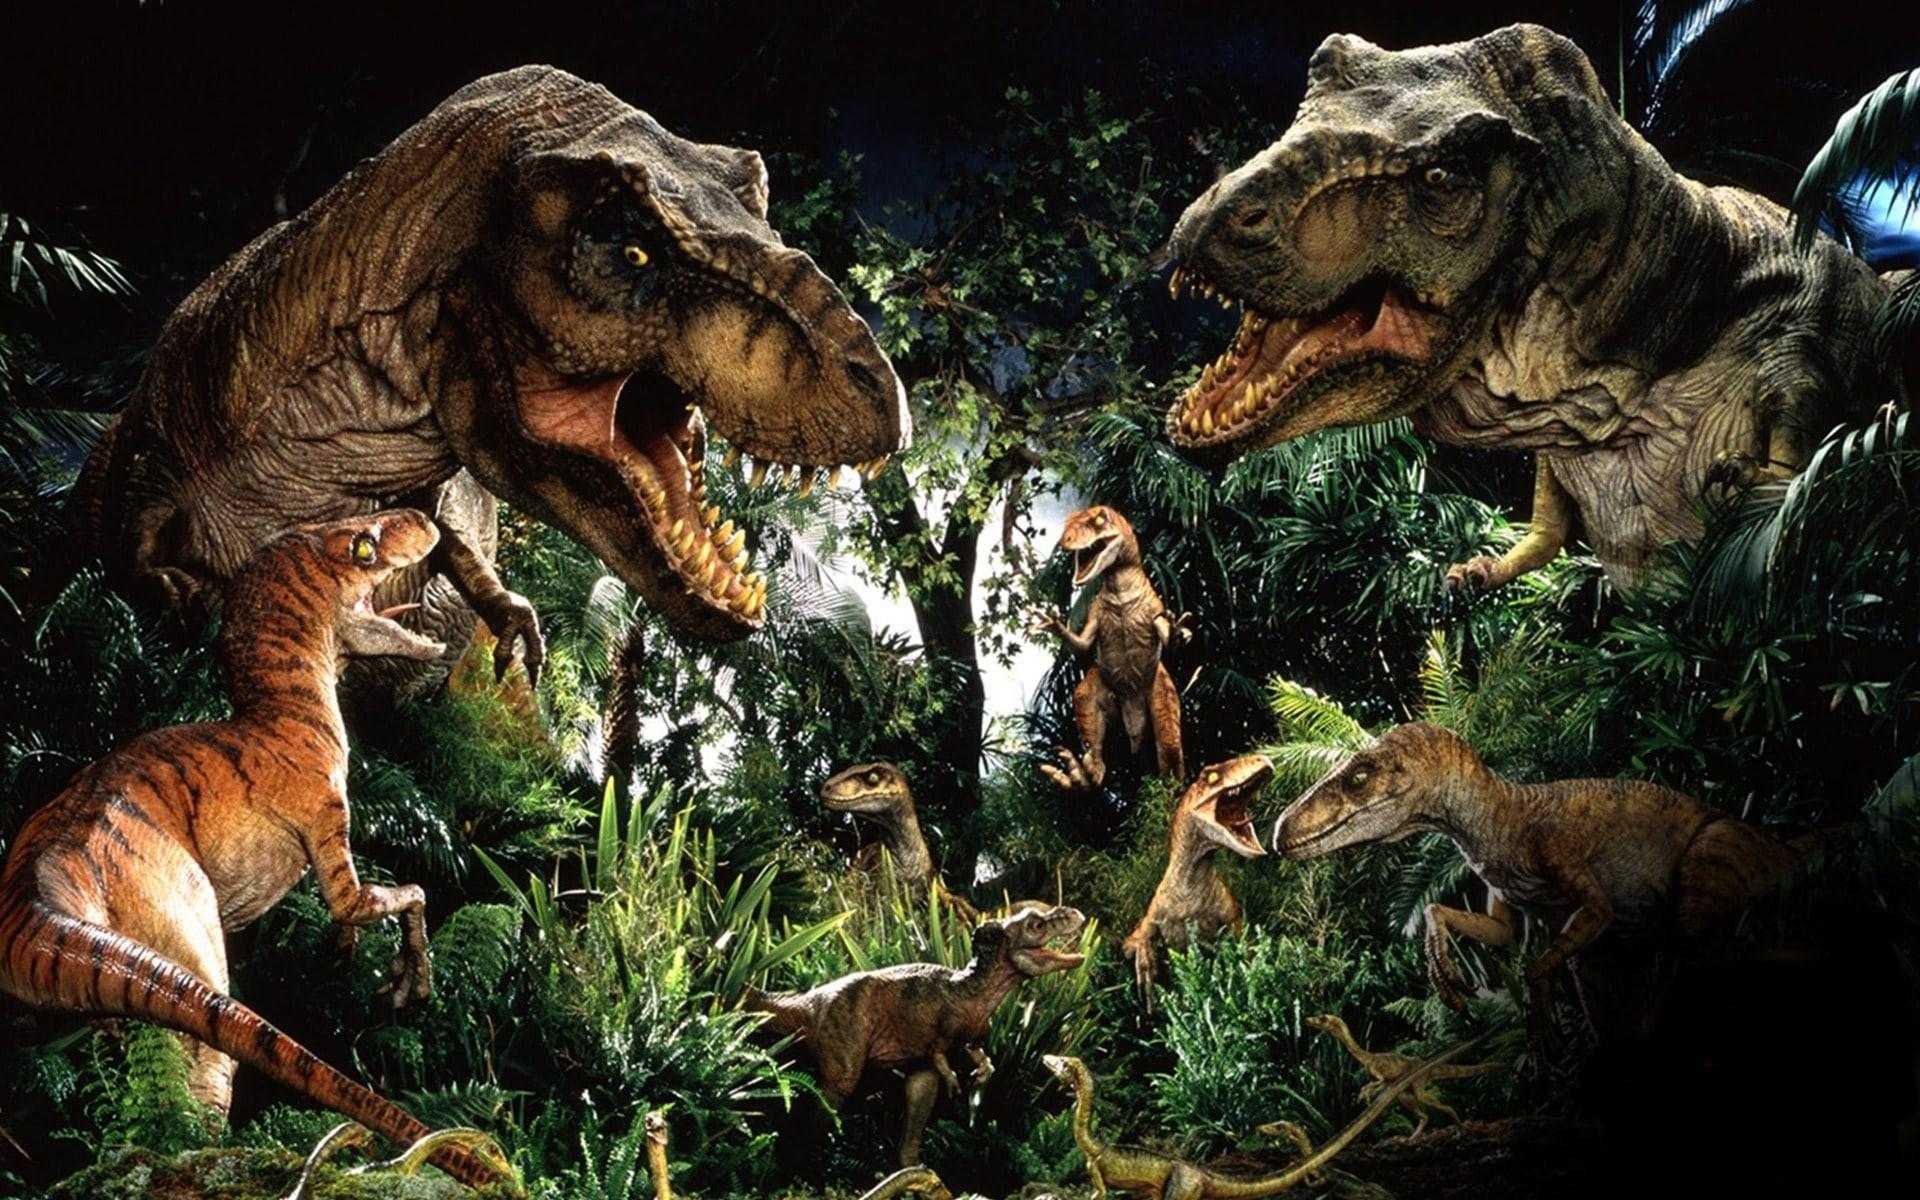 Res: 1920x1200, Jurassic World Backgrounds Jurassic World Wallpaper